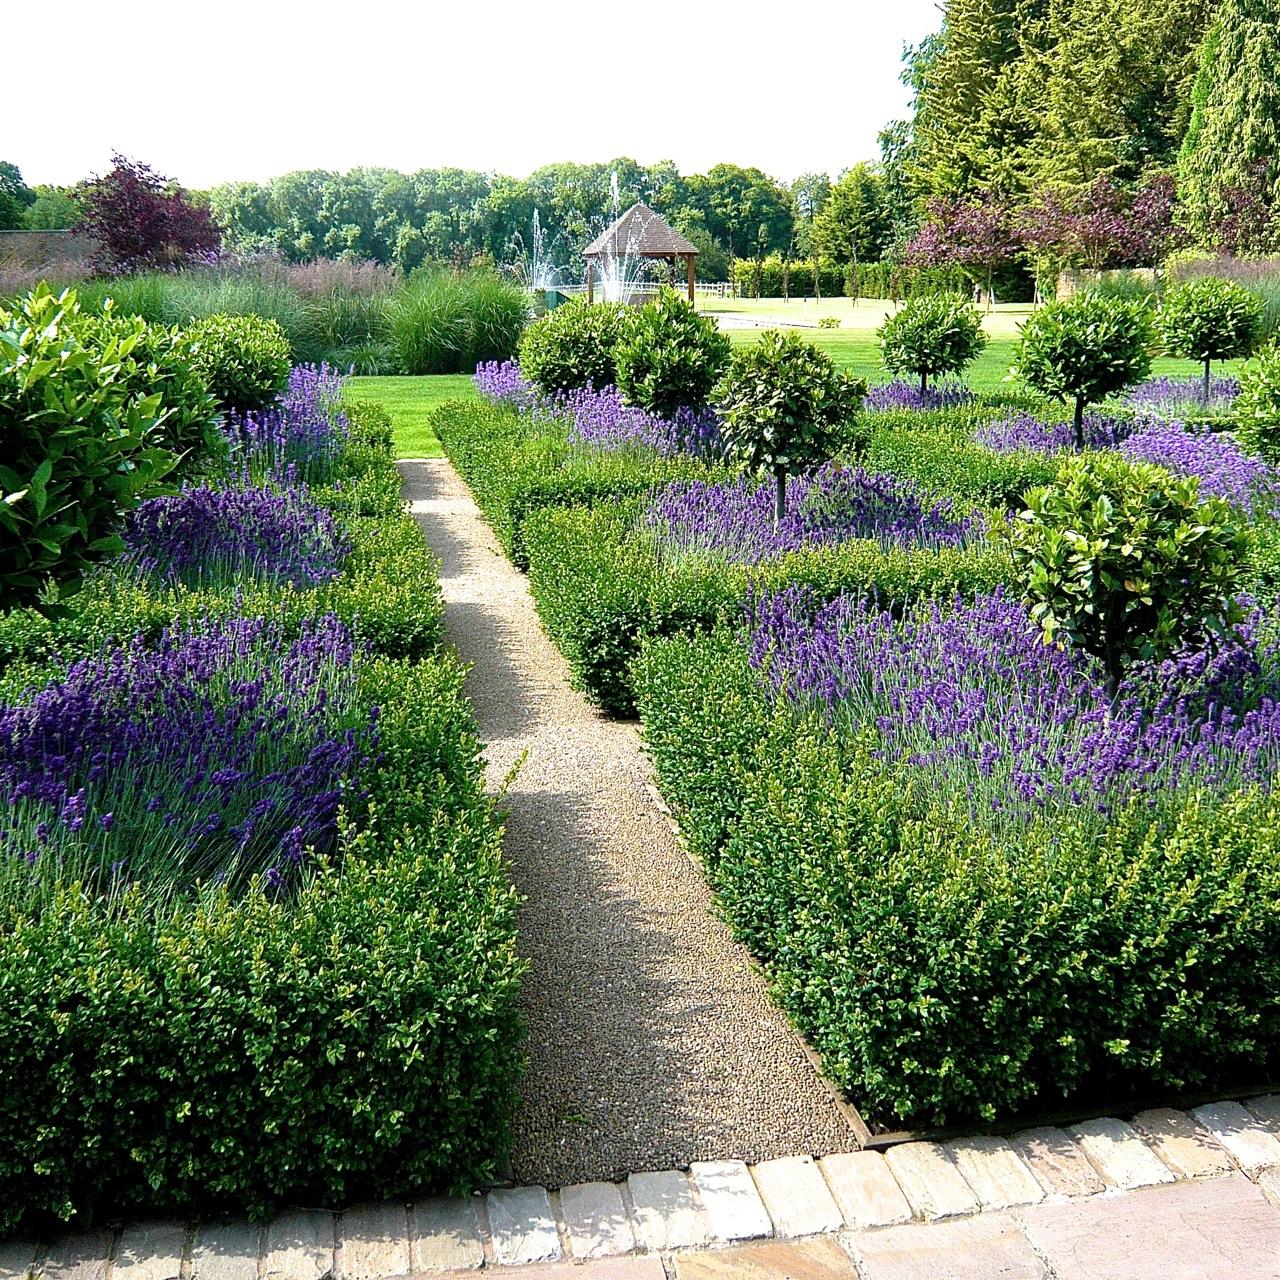 Large gardens estates jo alderson phillips for Garden parterre designs